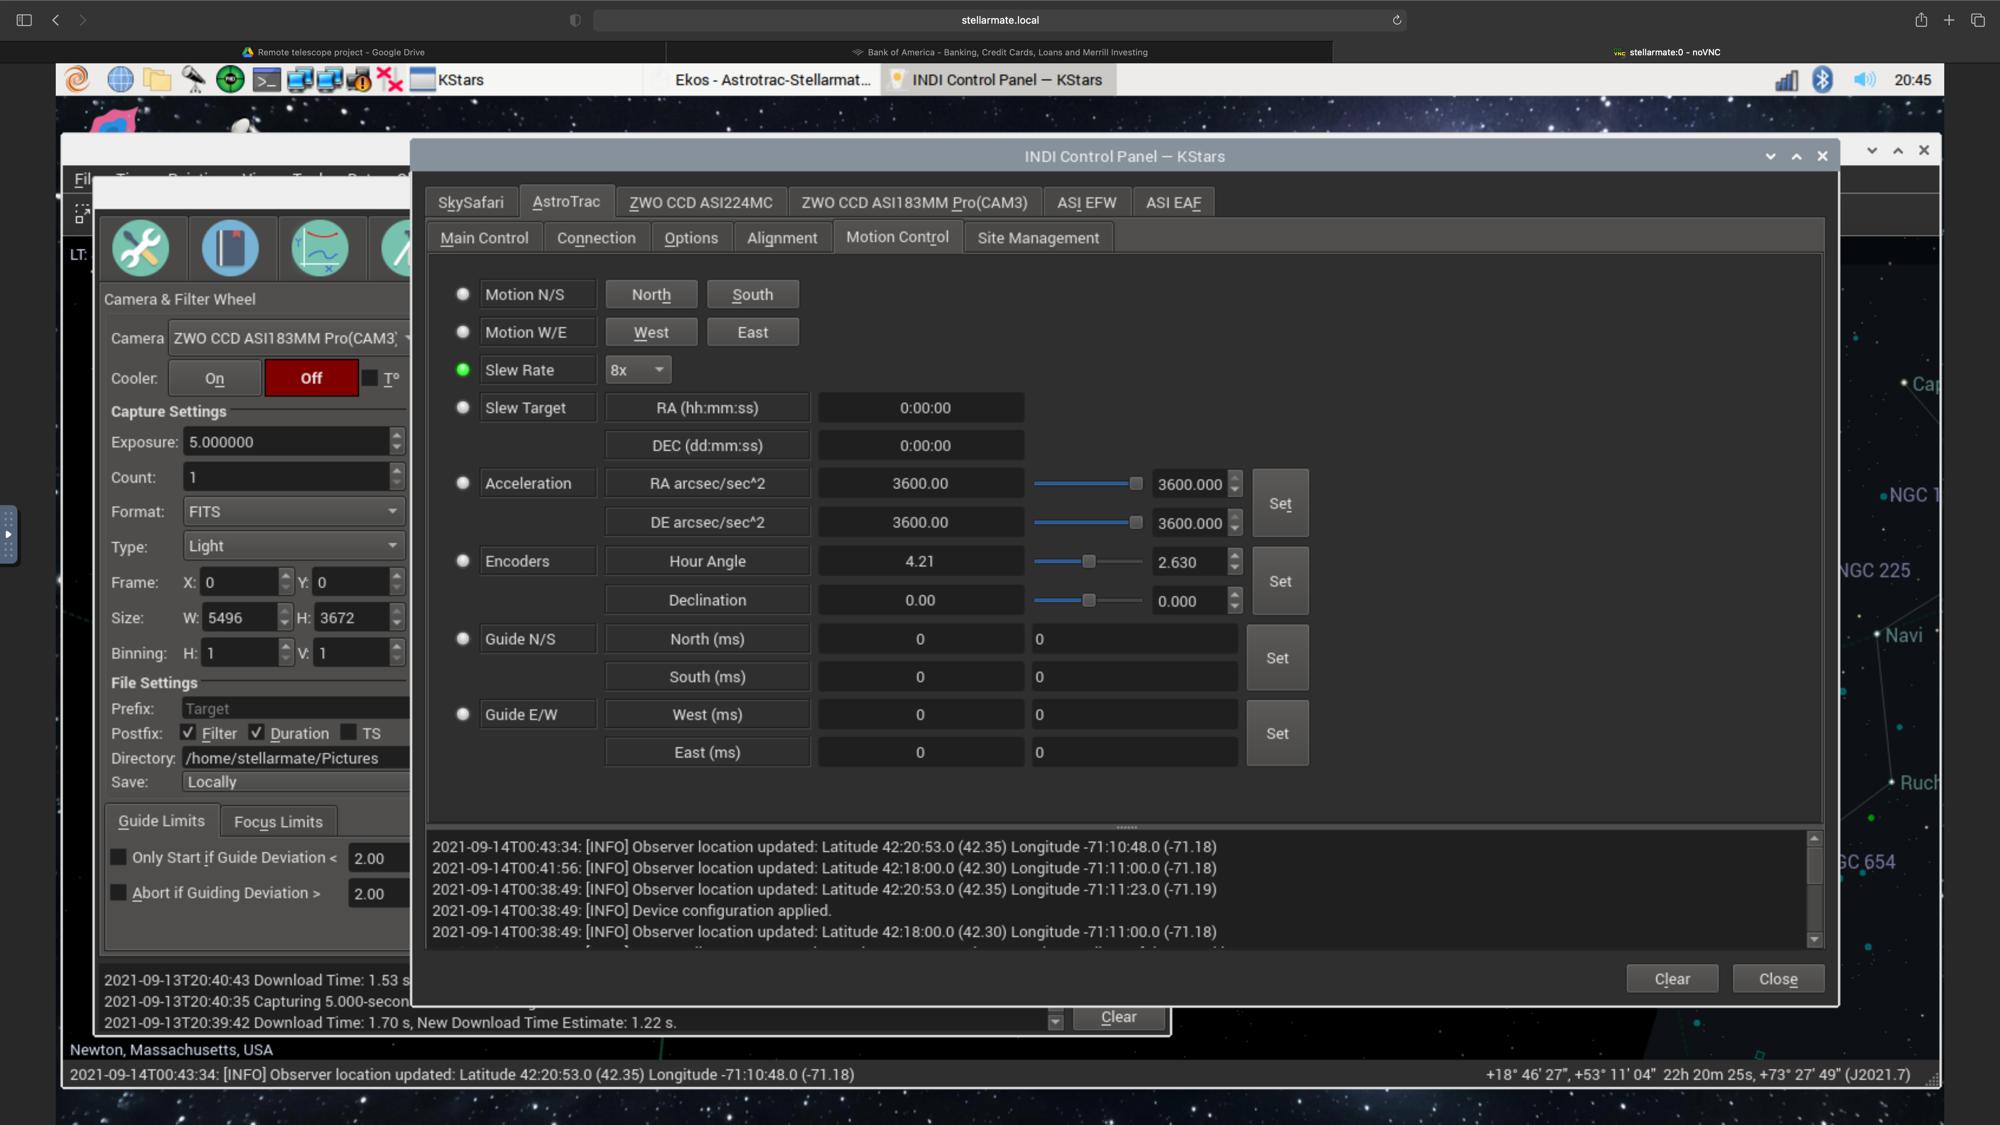 ScreenShot2021-09-13at8.45.06PM.png